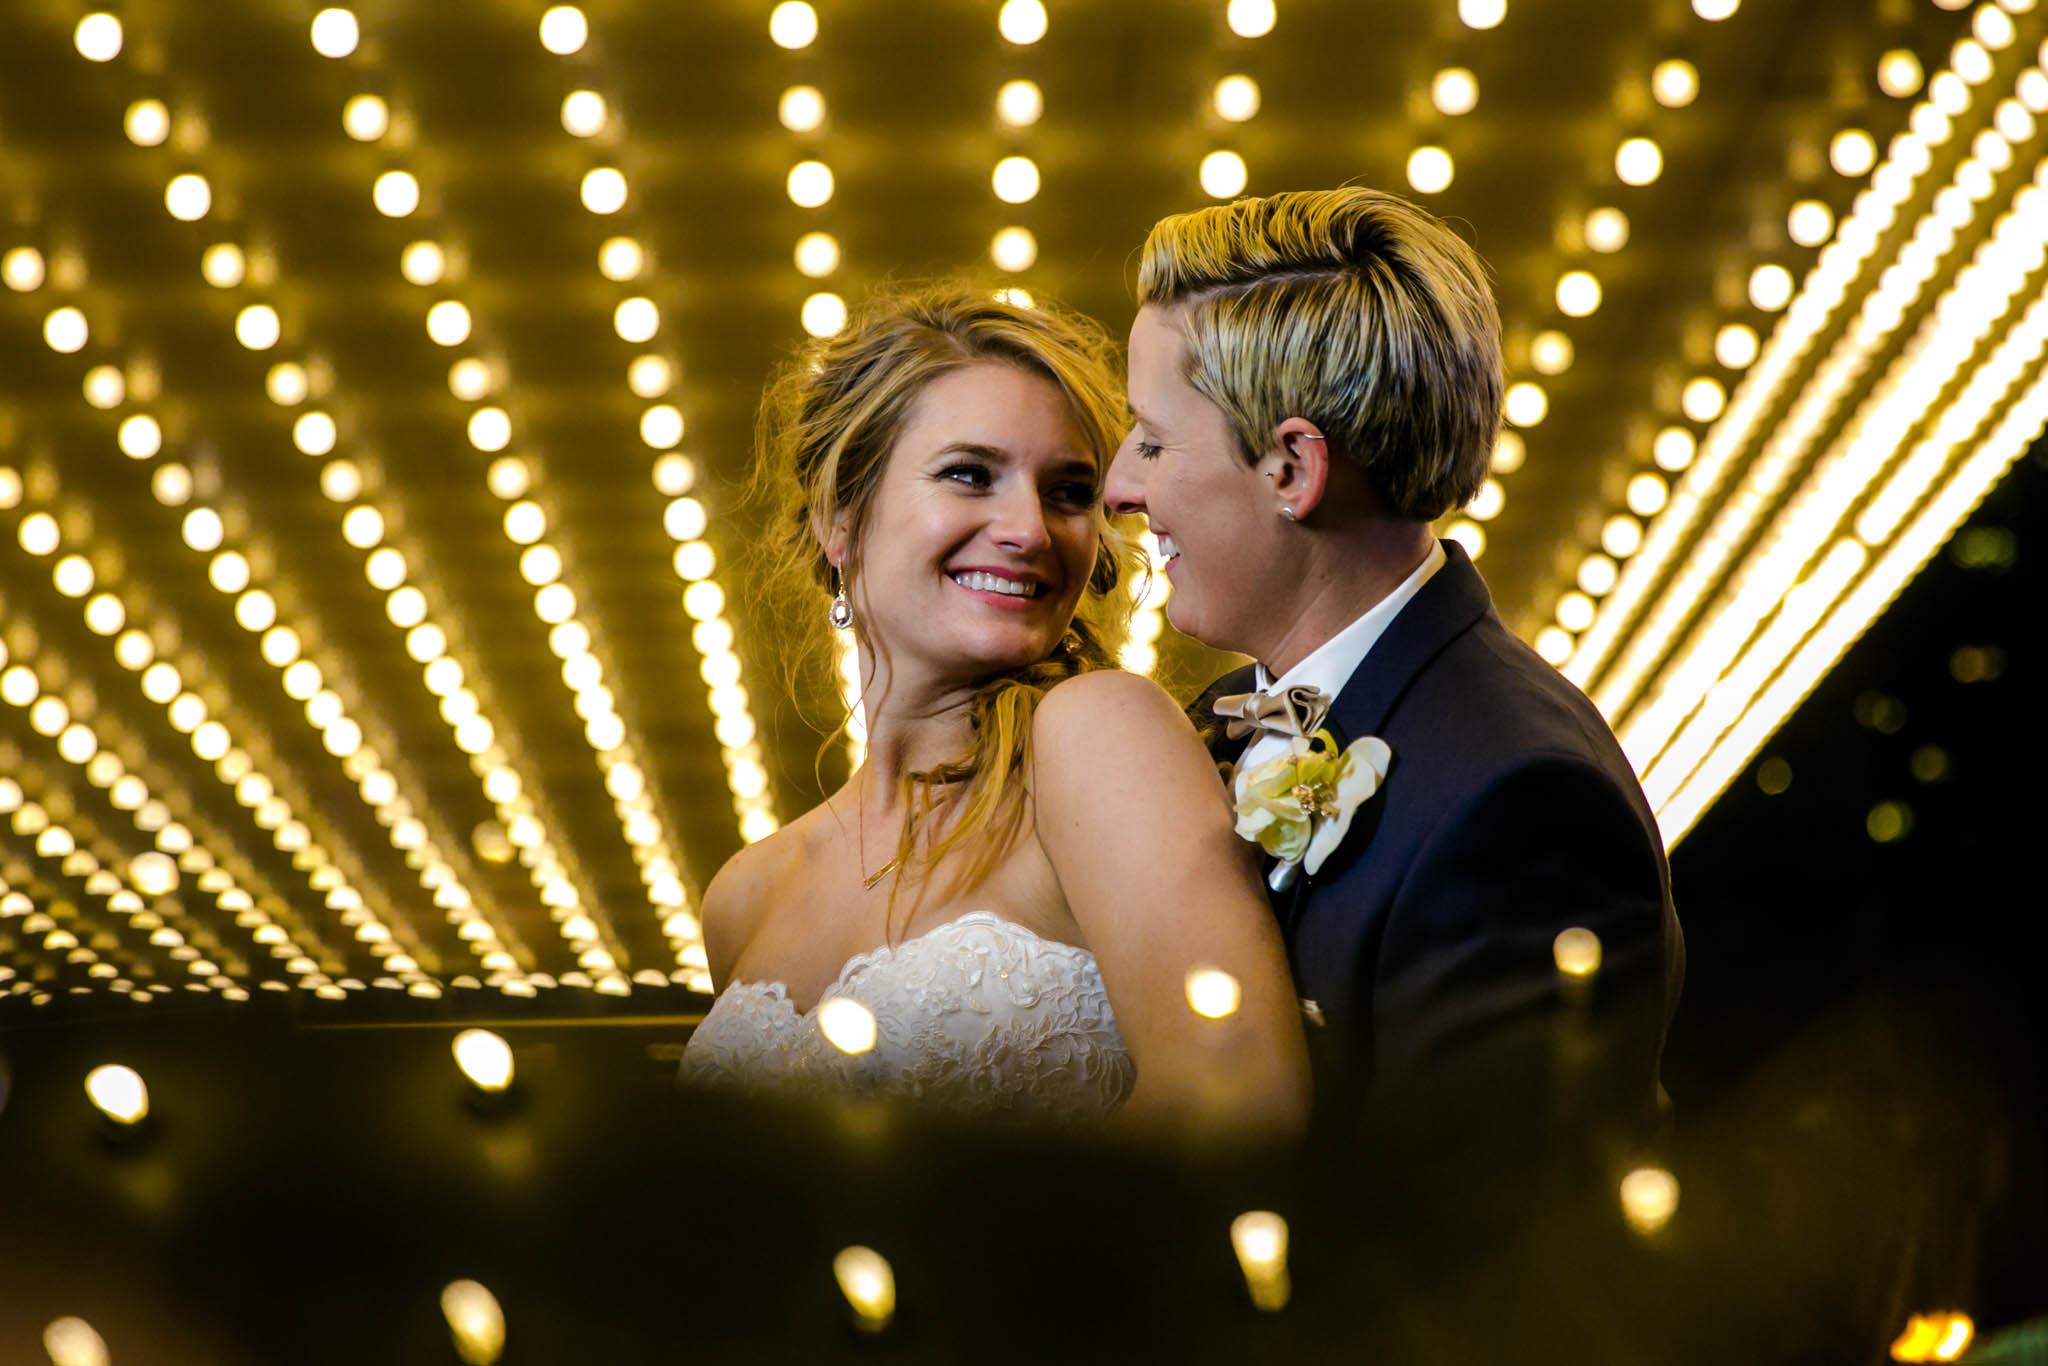 Chicago same-sex wedding